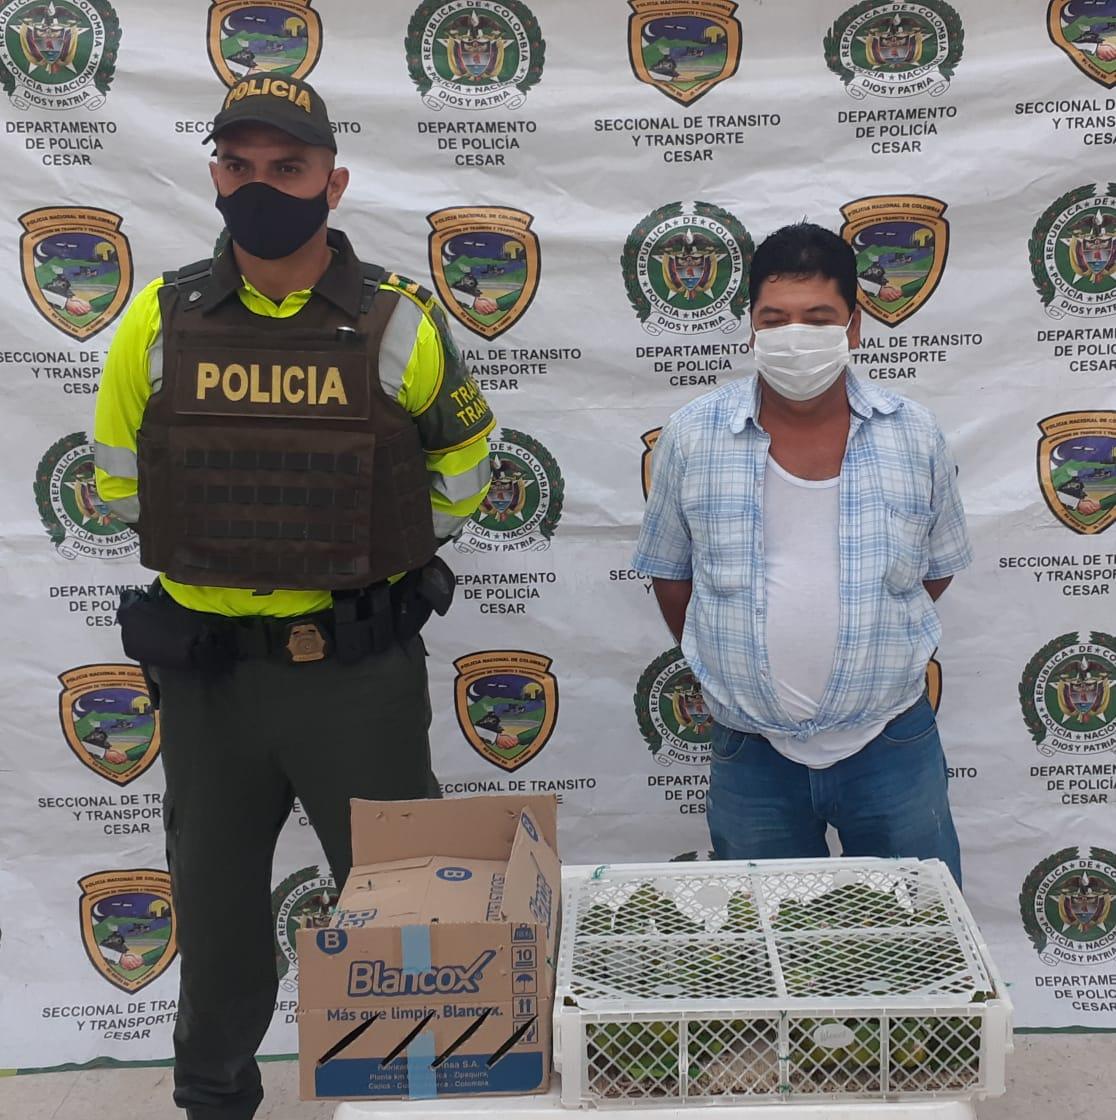 hoyennoticia.com, Lo cogieron con 90 pericos reales en Aguachica